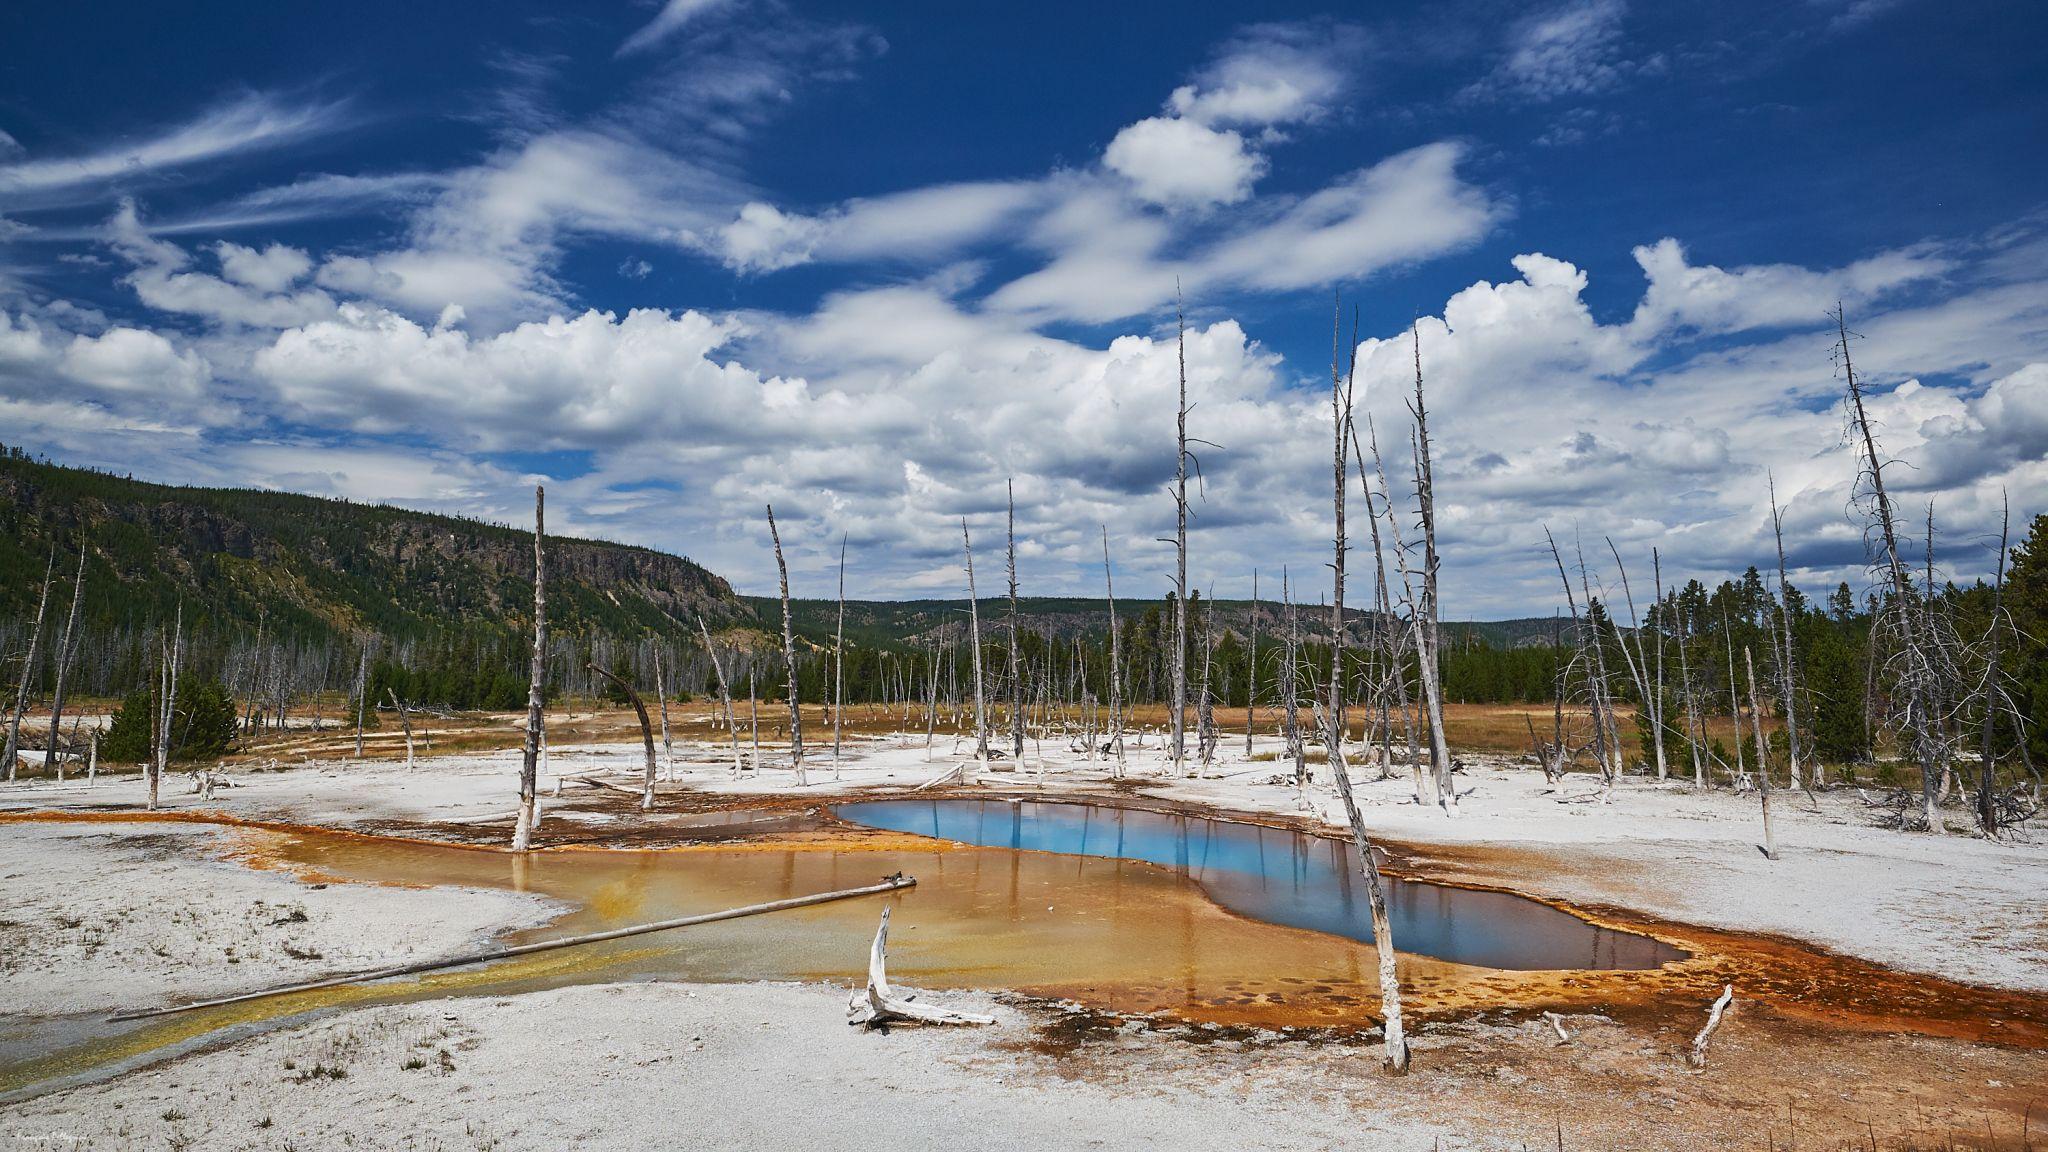 Opalescent Pool (Black Sand Basin), Yellowstone, USA